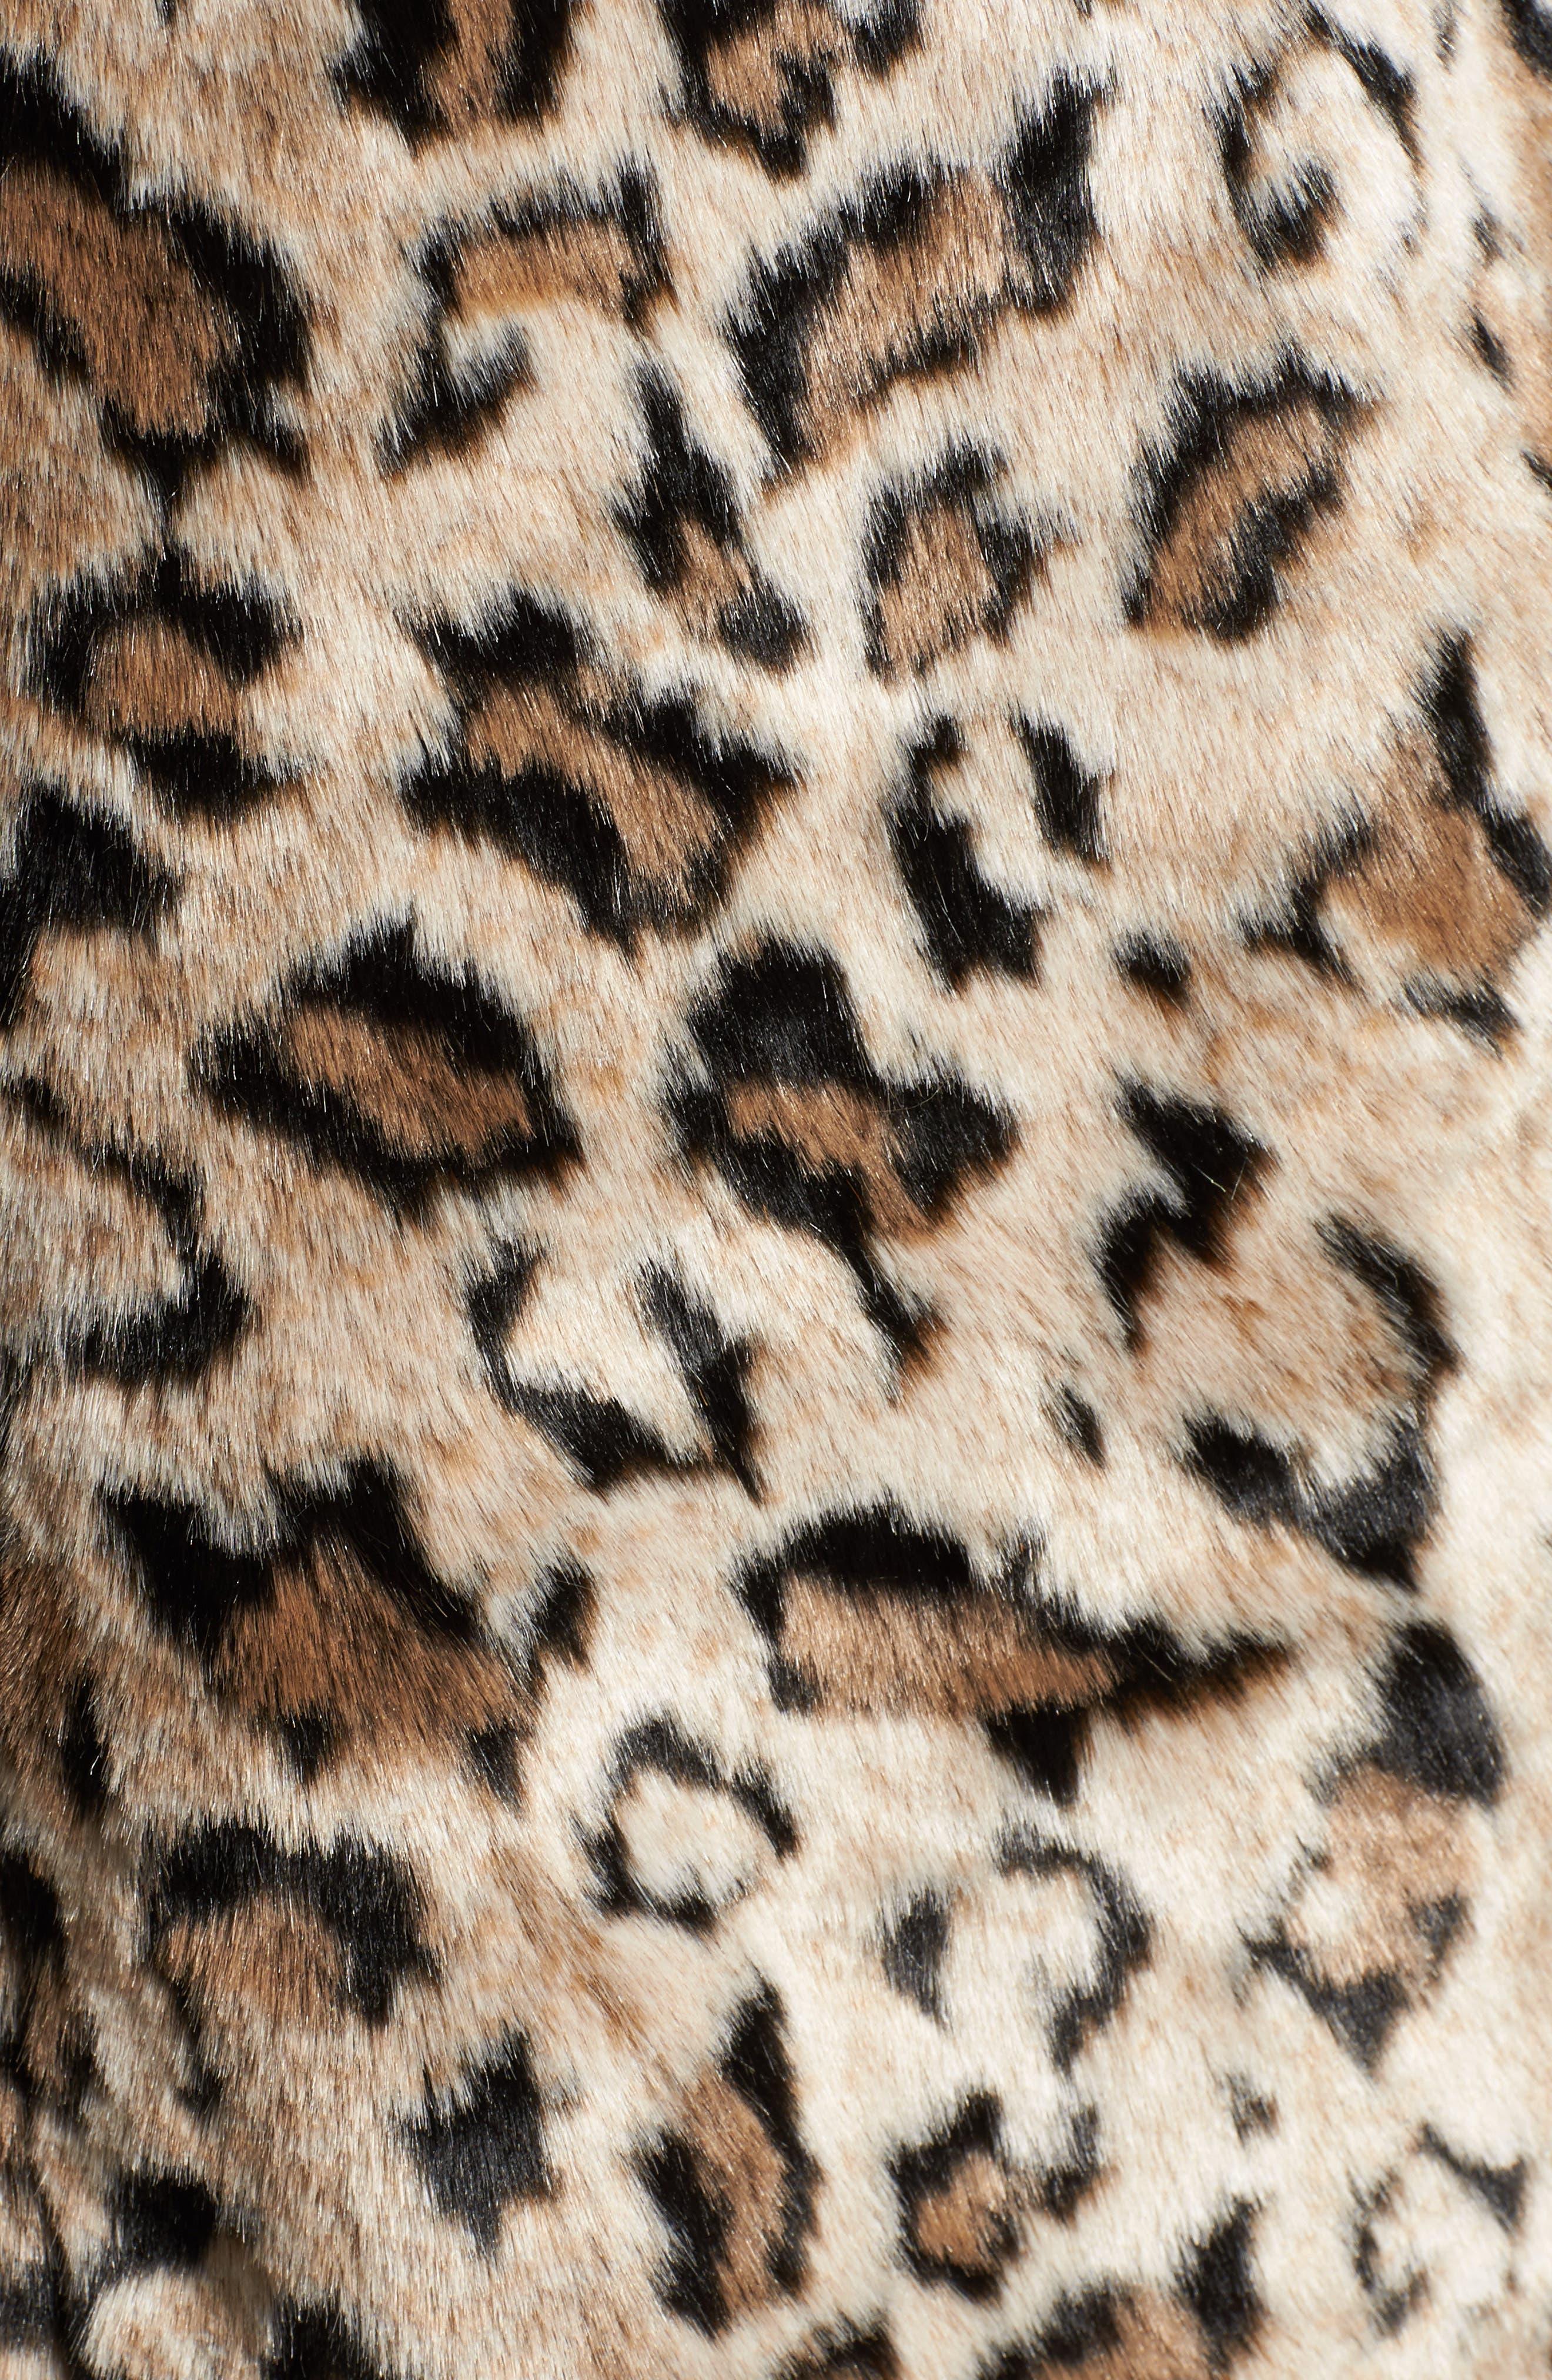 Abeni Faux Fur Coat,                             Alternate thumbnail 6, color,